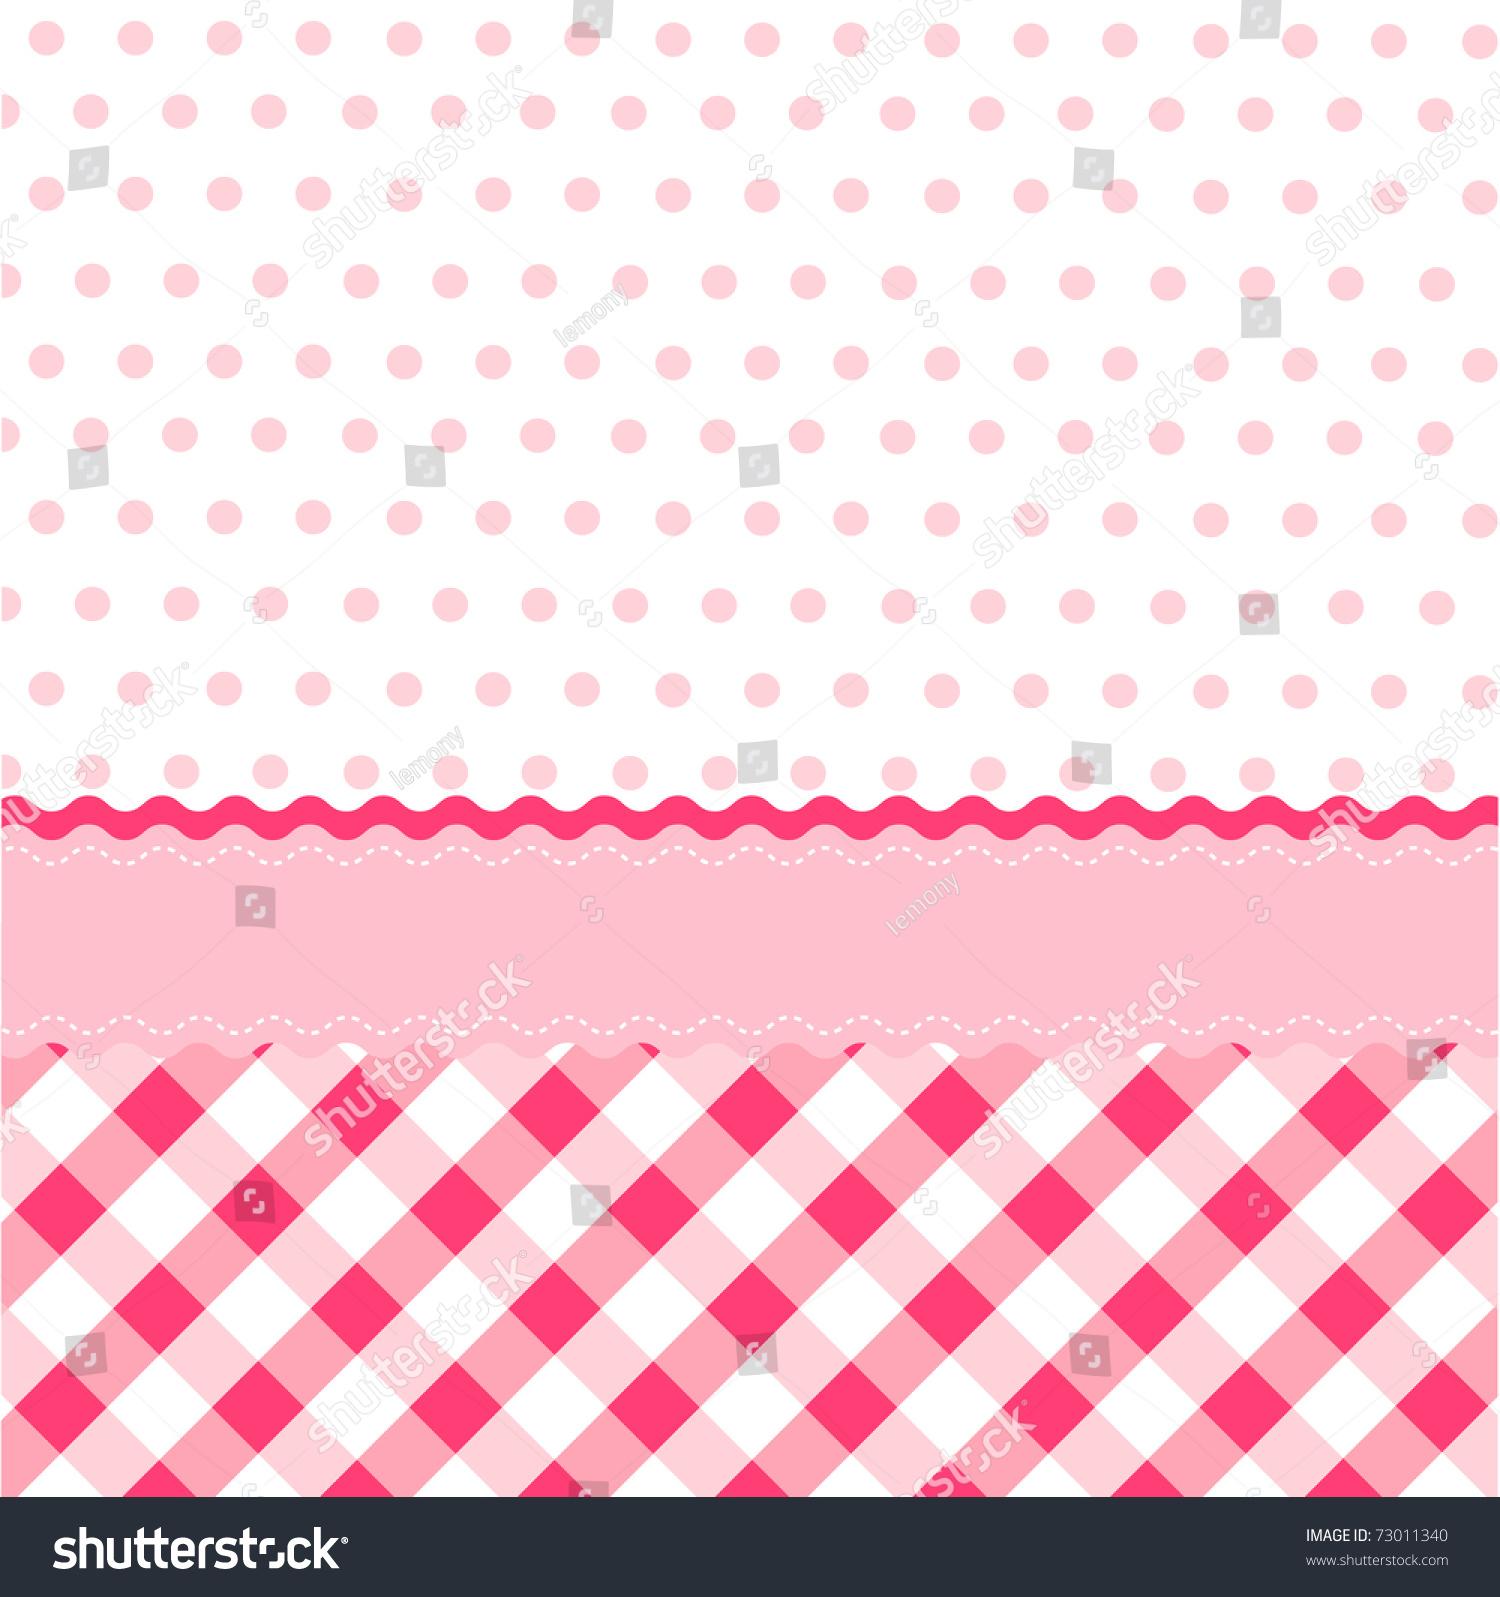 Seamless Baby Girl Pattern Wallpaper Stock Vector 73011340 ...